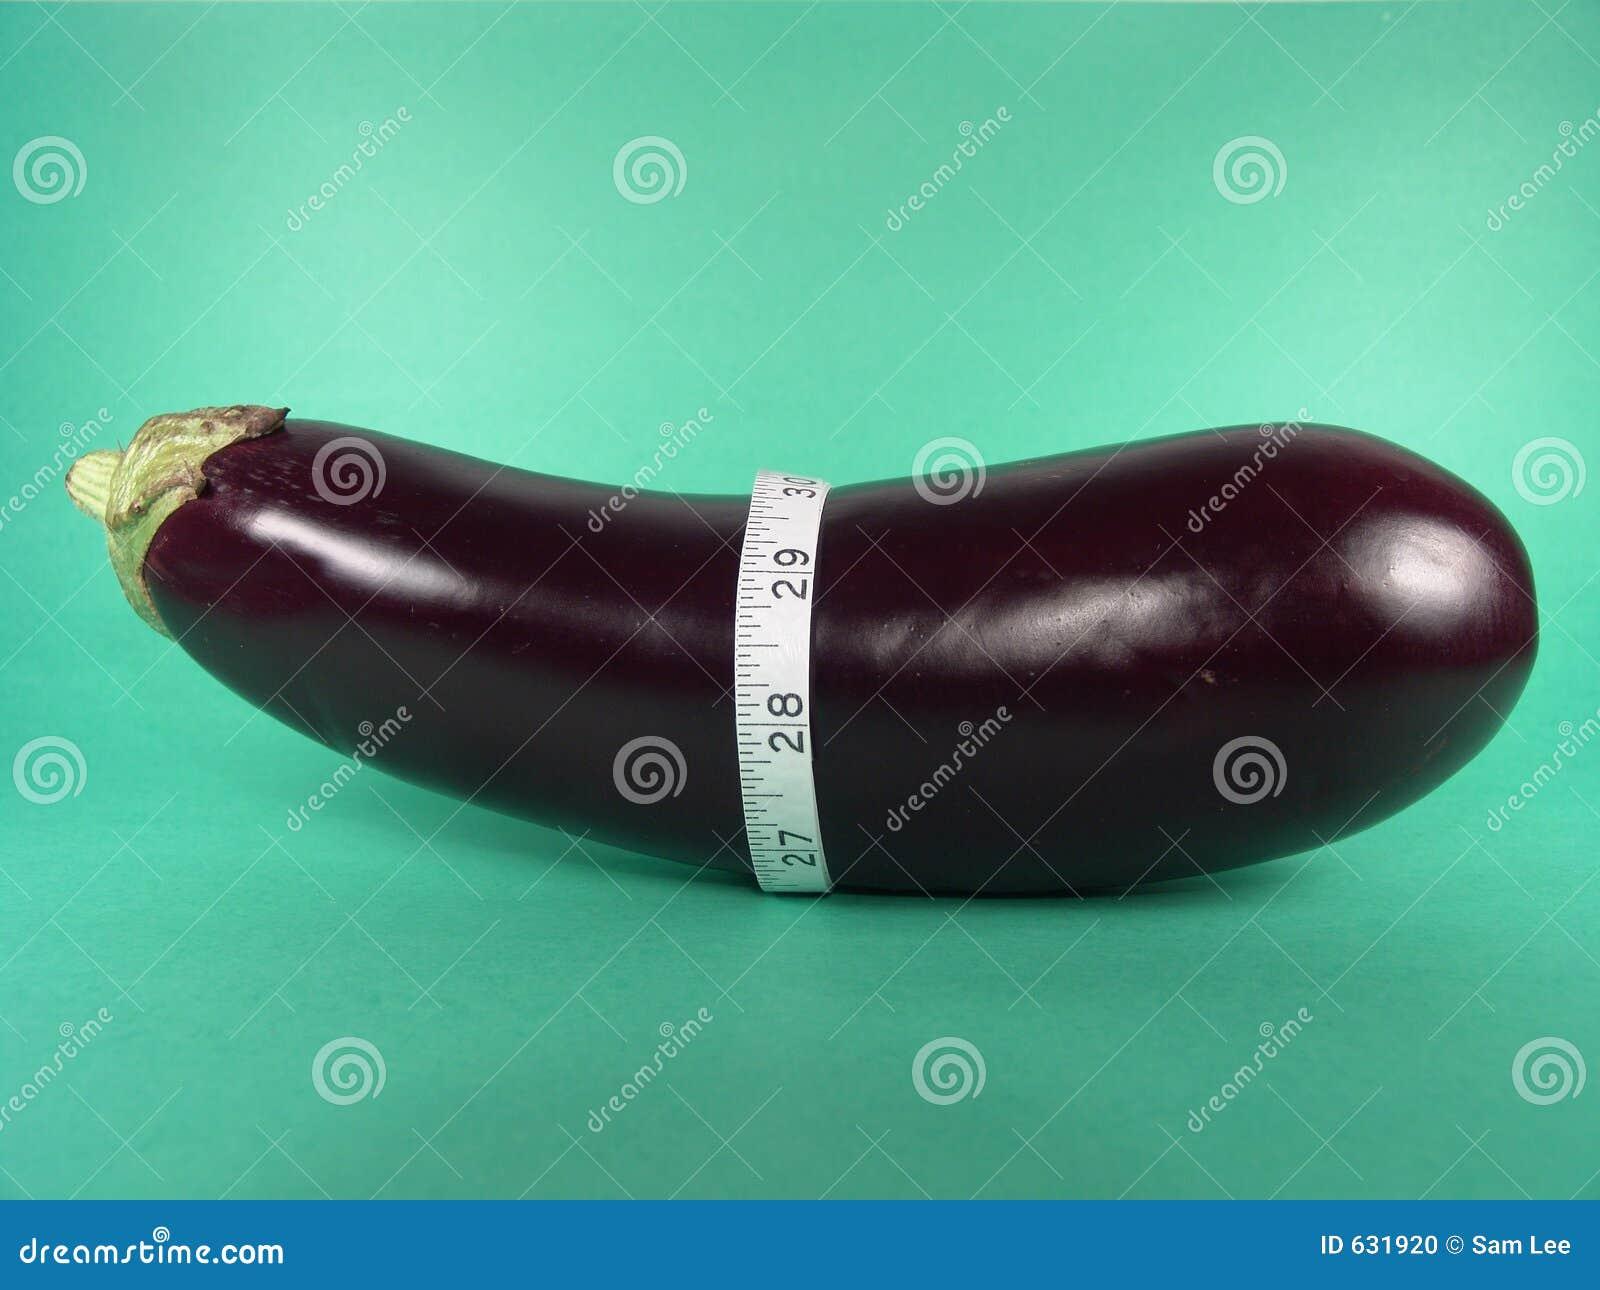 Eggplant Measuring Tape